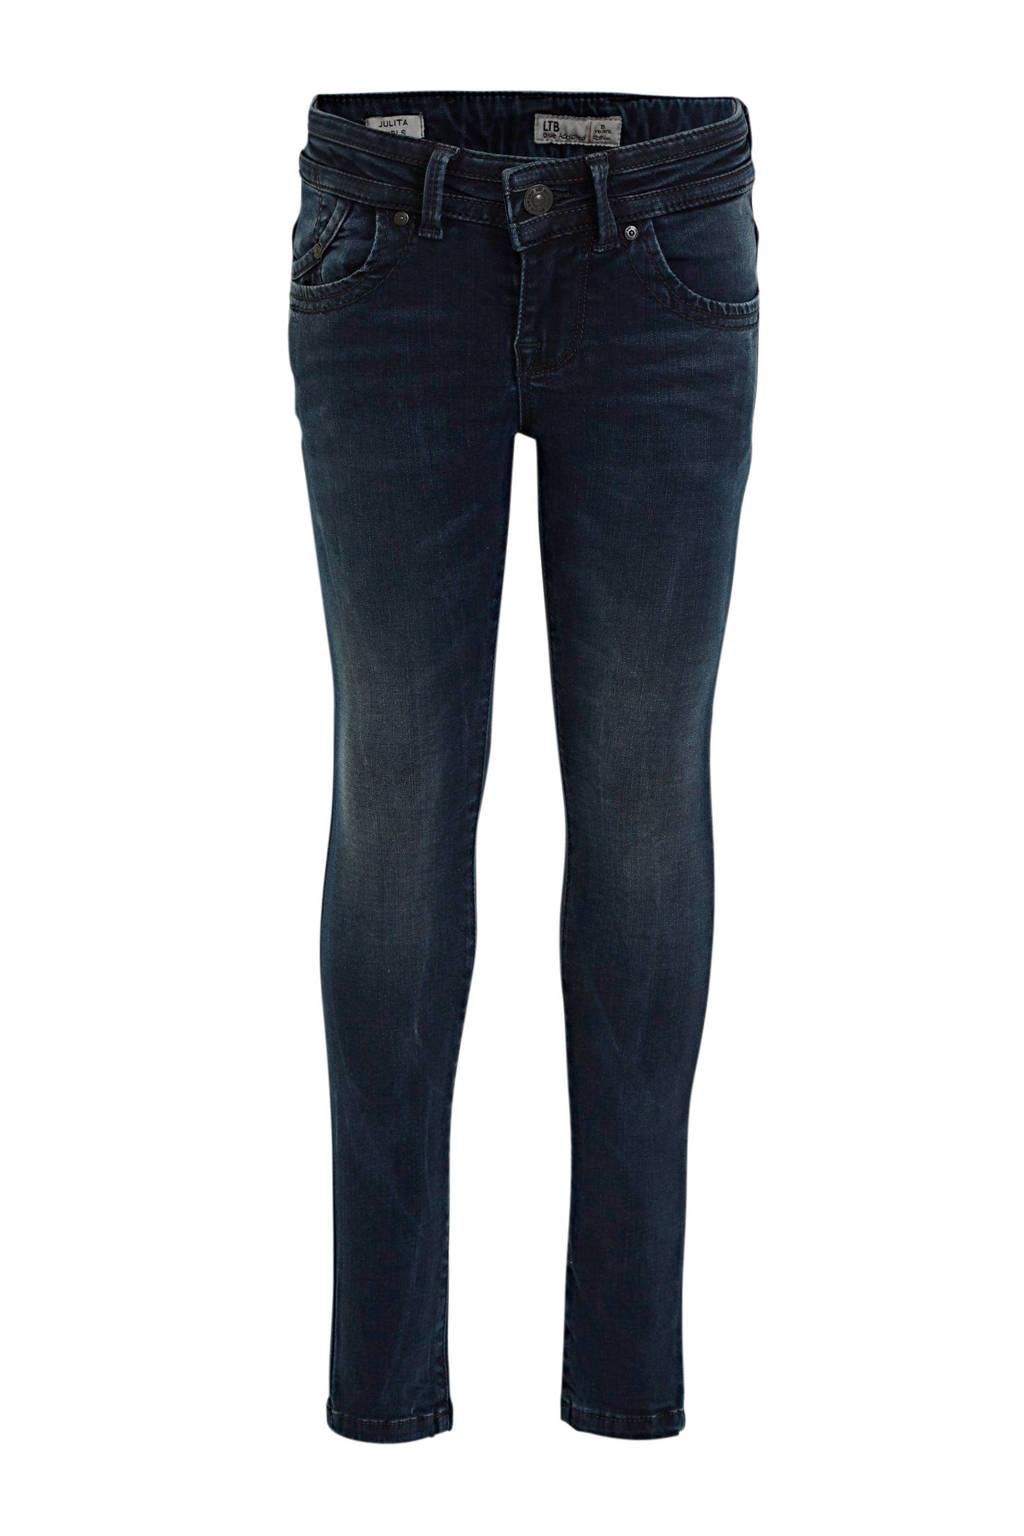 LTB super skinny jeans Julita sueta wash, Sueta wash